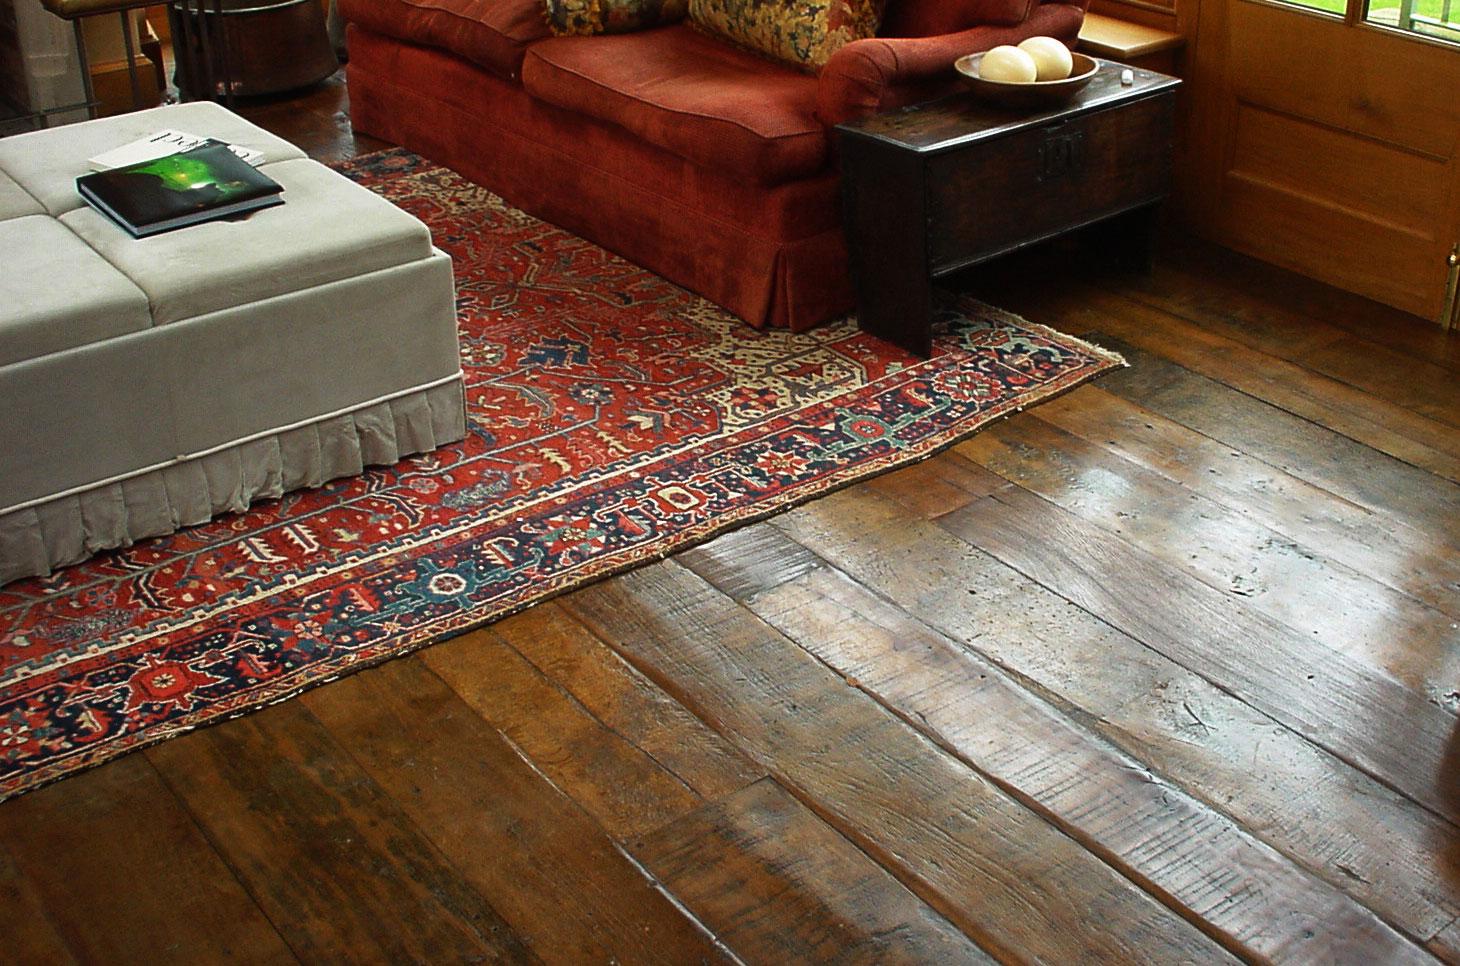 Antique hardwood wideboards from David Gunton Hardwood Floors, from £120 m2